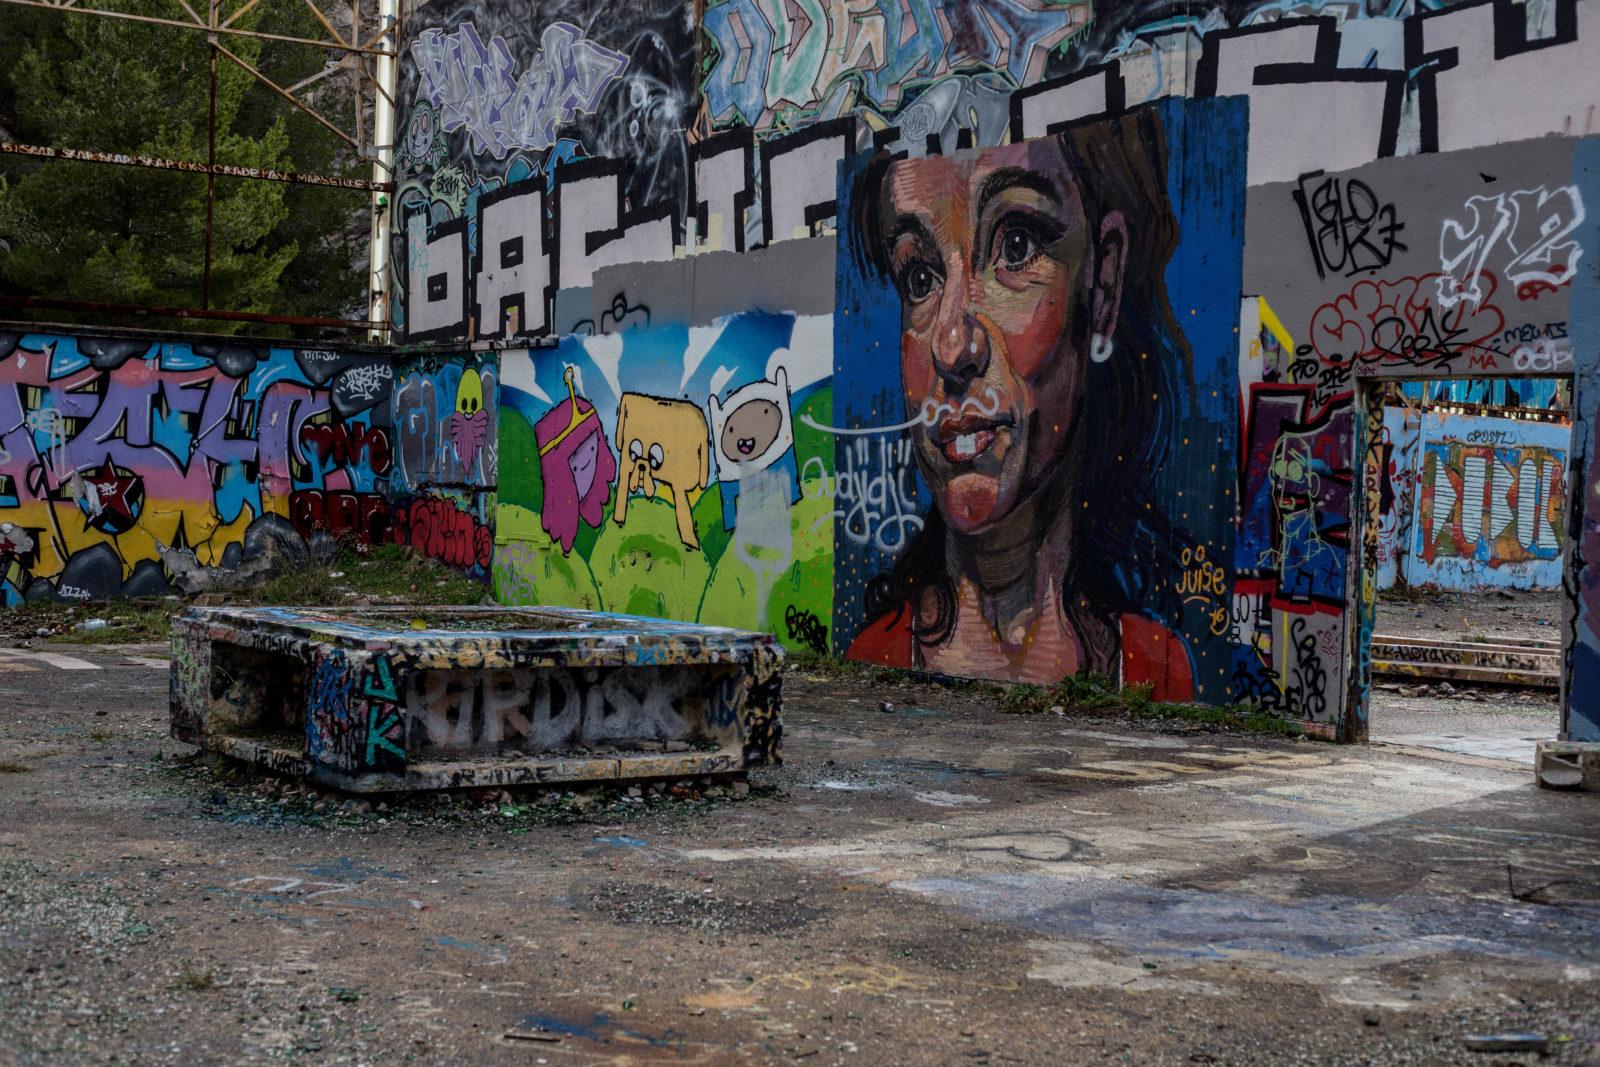 urbex jeanpantaleo skate Marseille LaCaverne tags graffitiIMG7061 - Des tricks et du freestyle avec Jean Pantaleo dans un skatepark 100% DIY